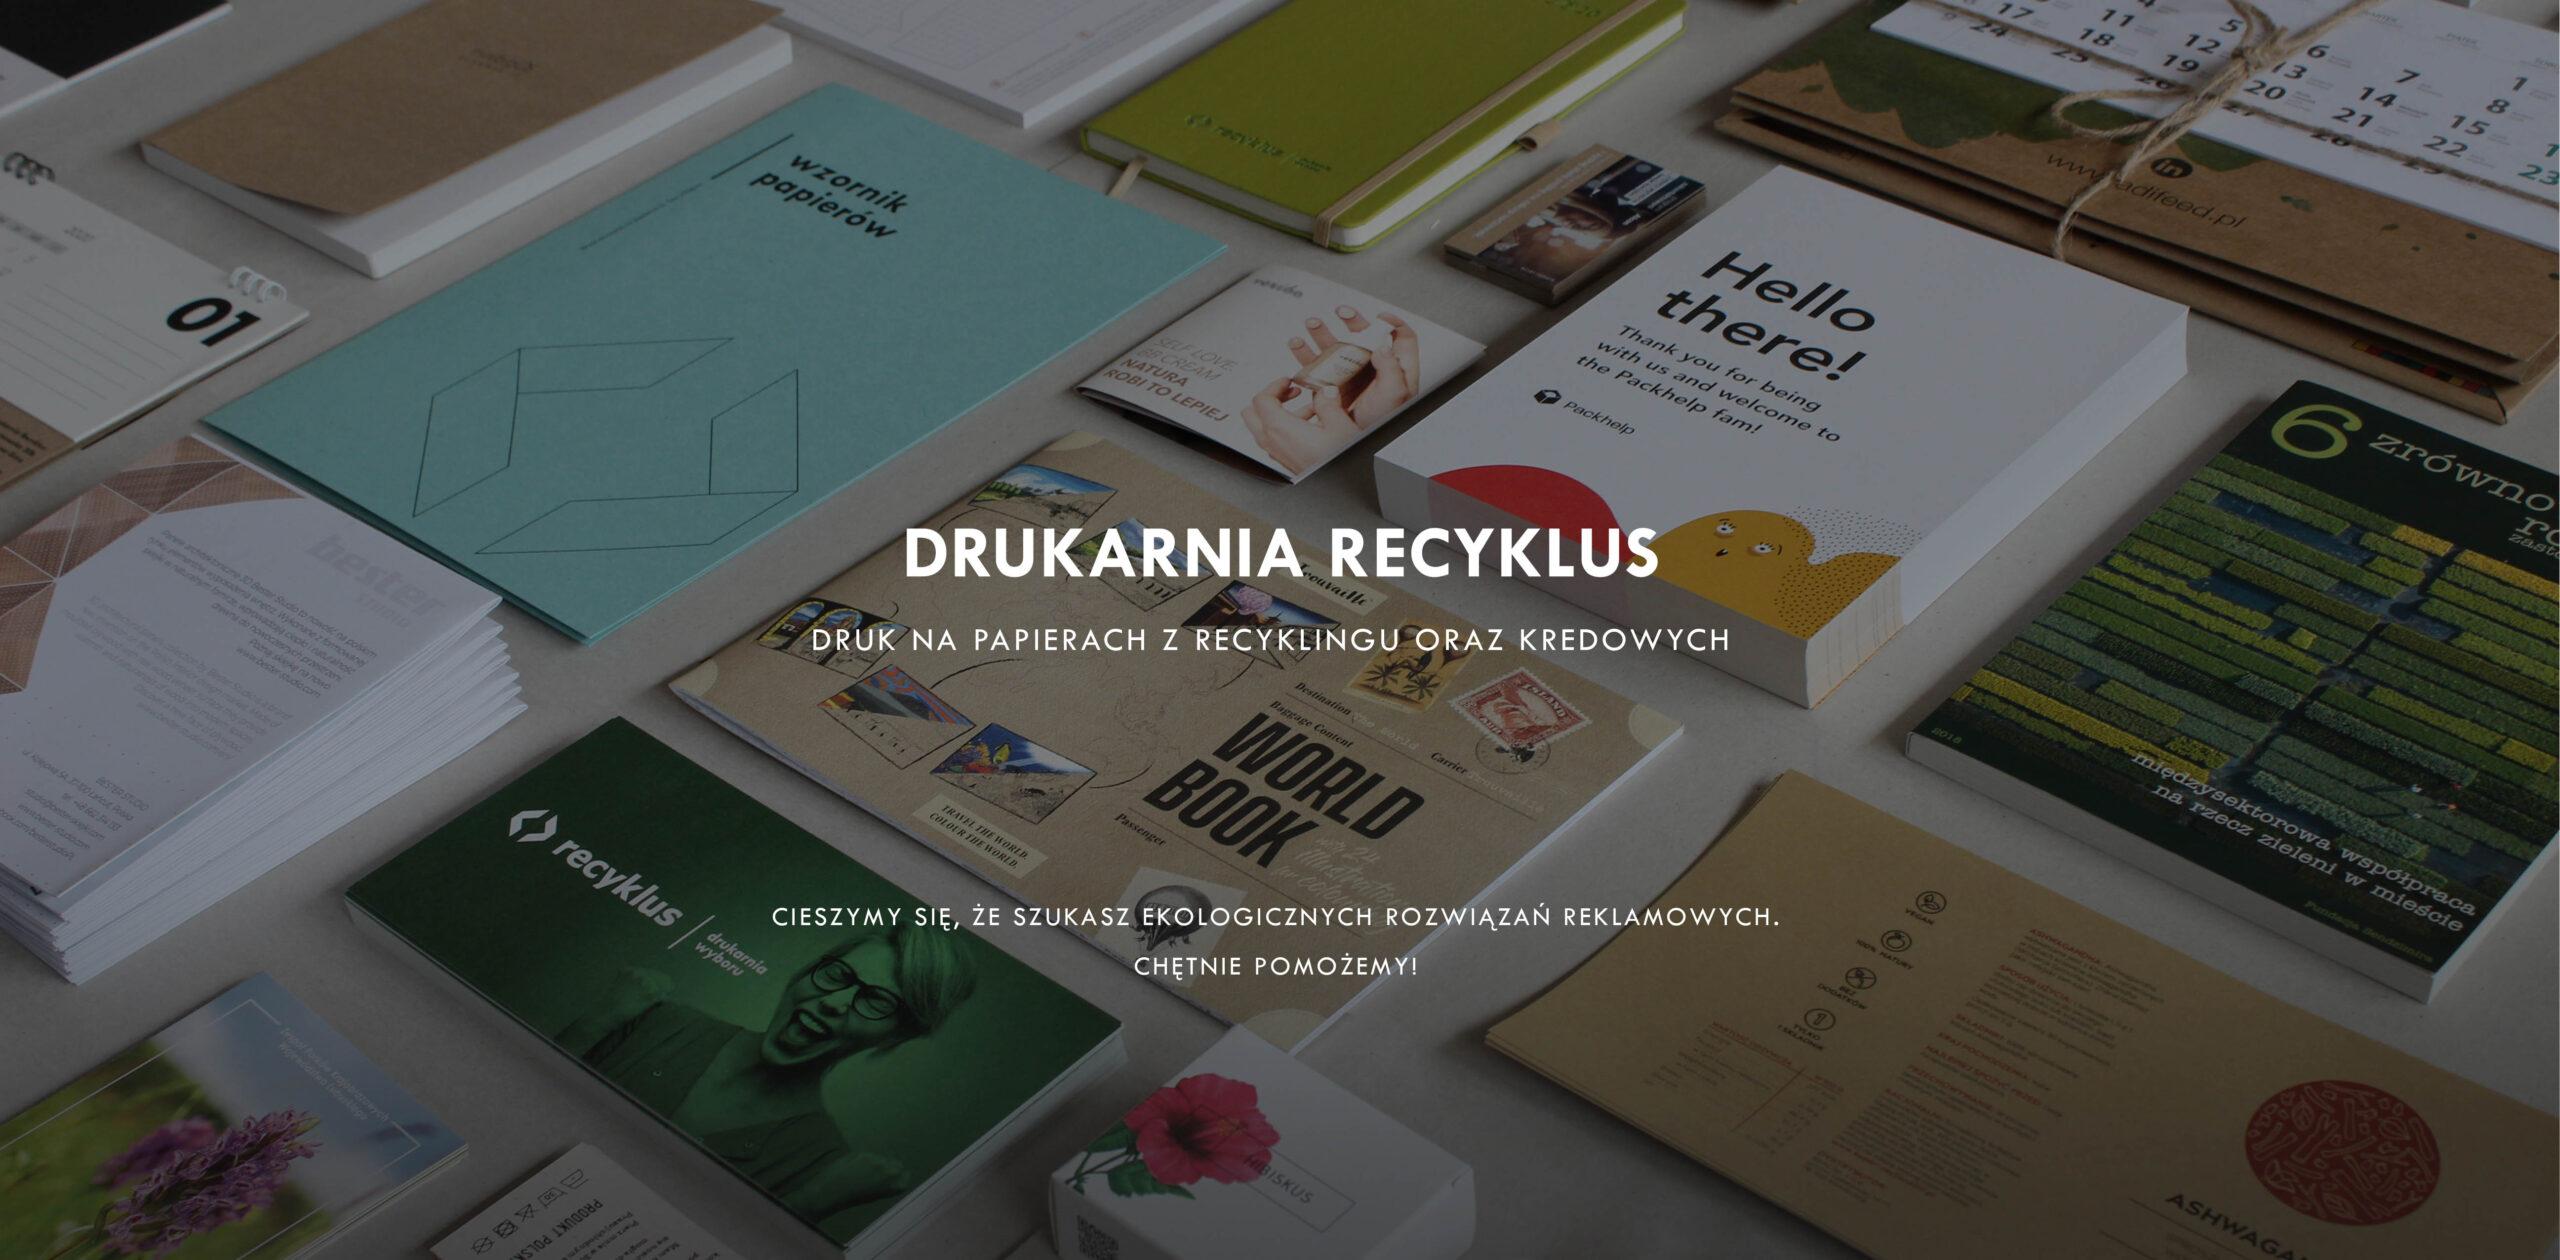 drukarnia online, drukarnia internetowa, drukarnia Zielona Góra